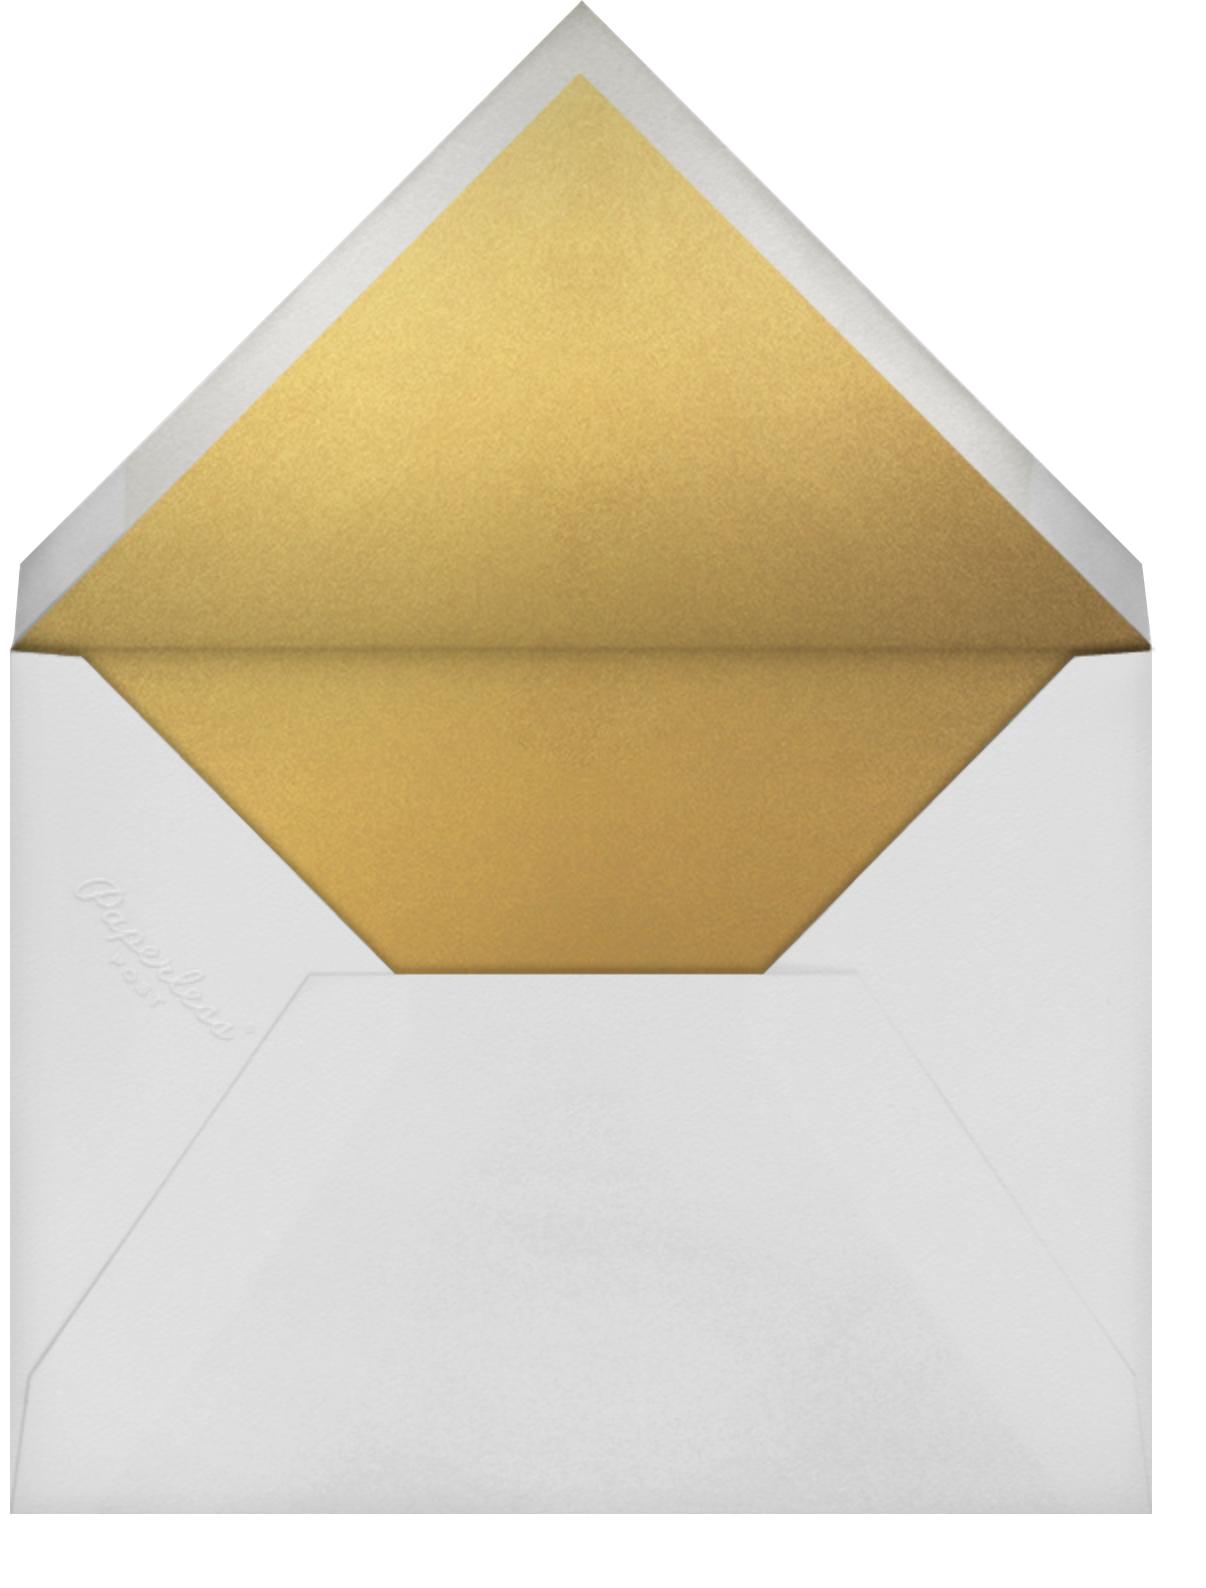 Big Year - Paperless Post - Milestone  - envelope back